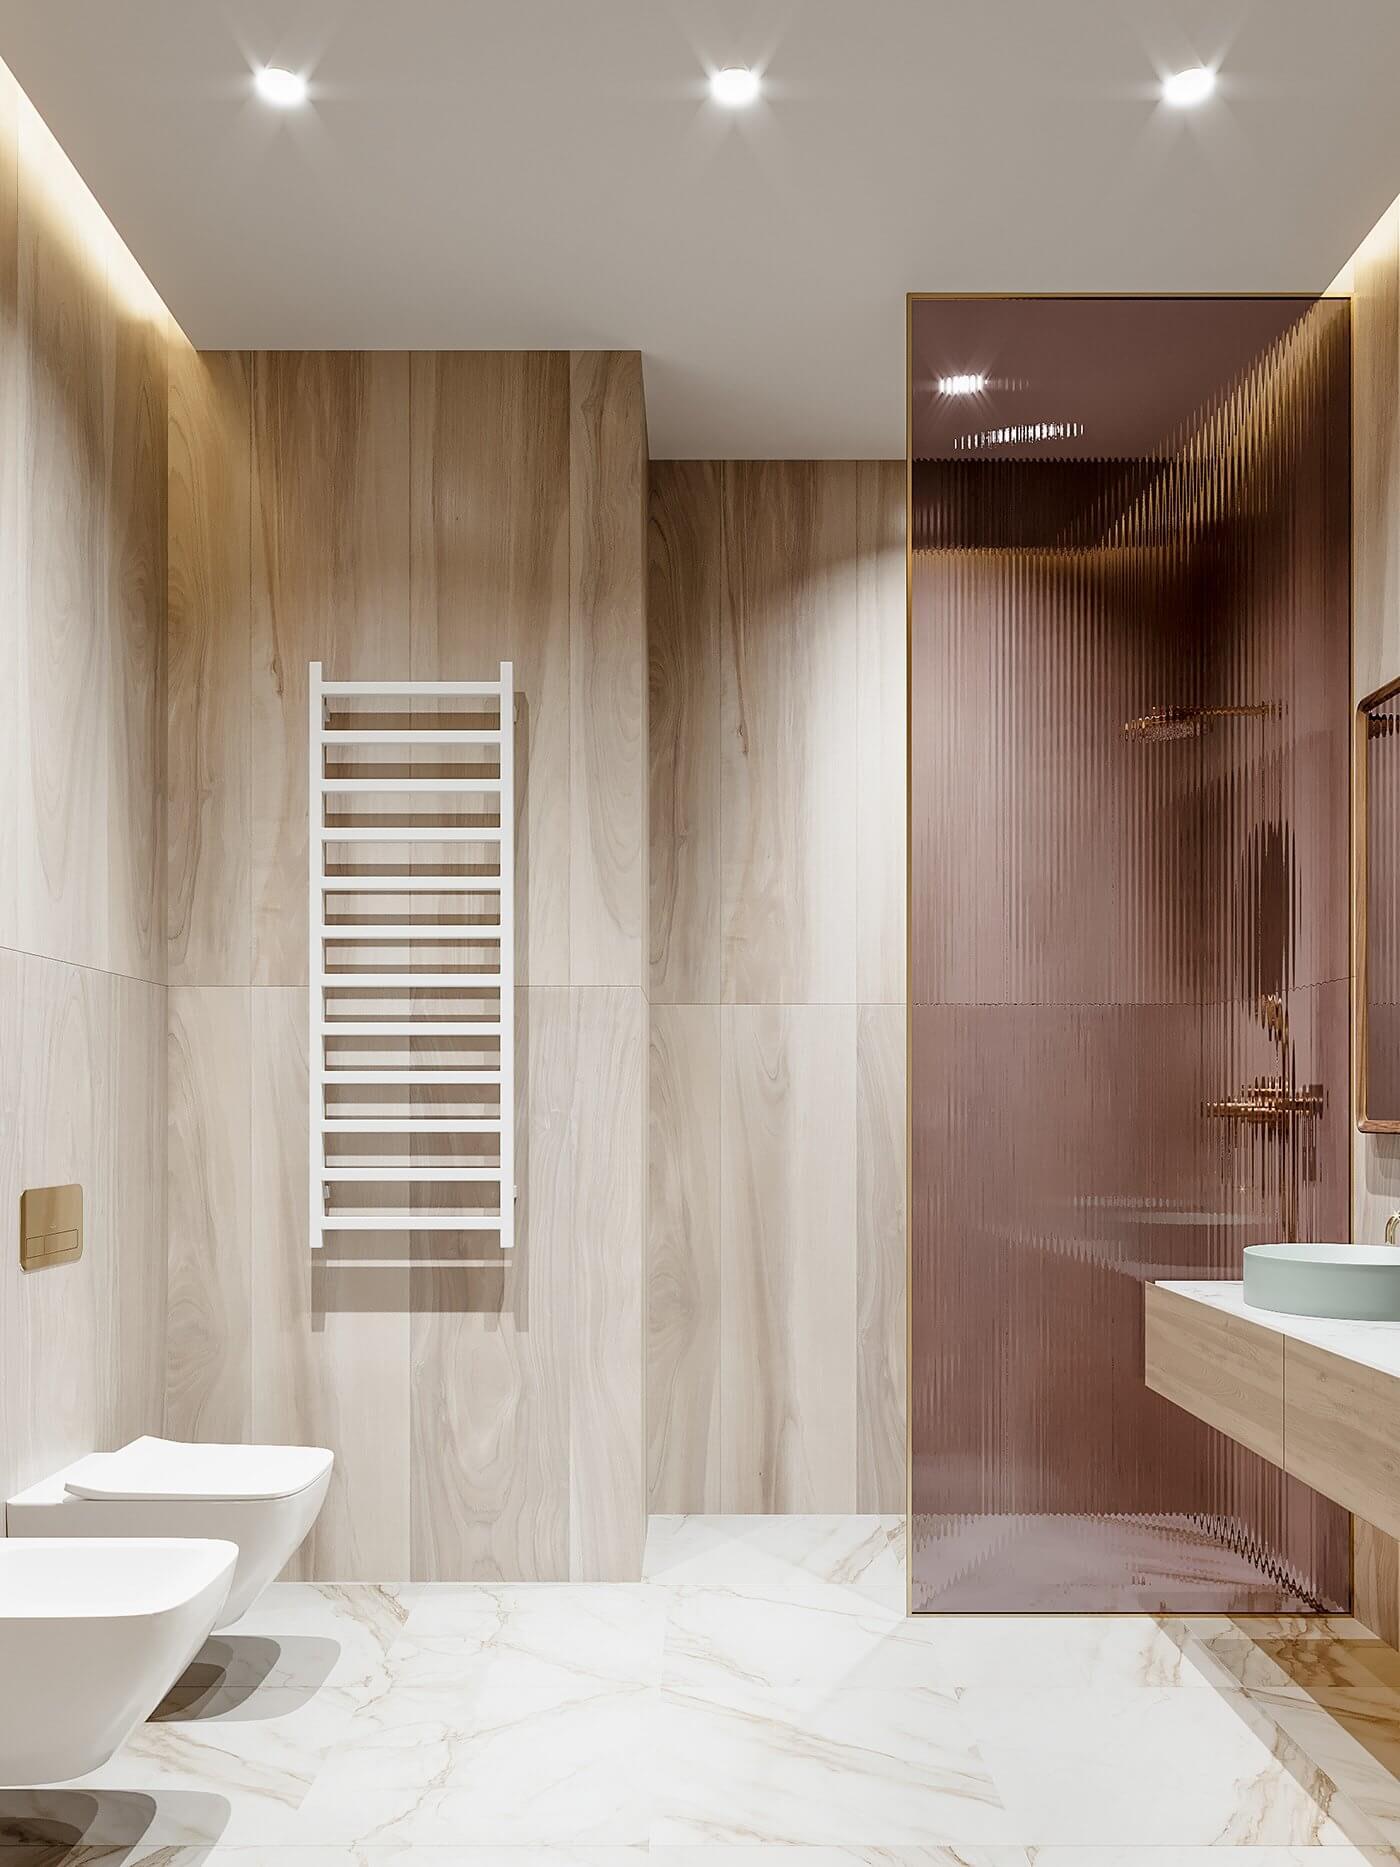 Green gold Apartment bathroom wall cladding wood - cgi visualization